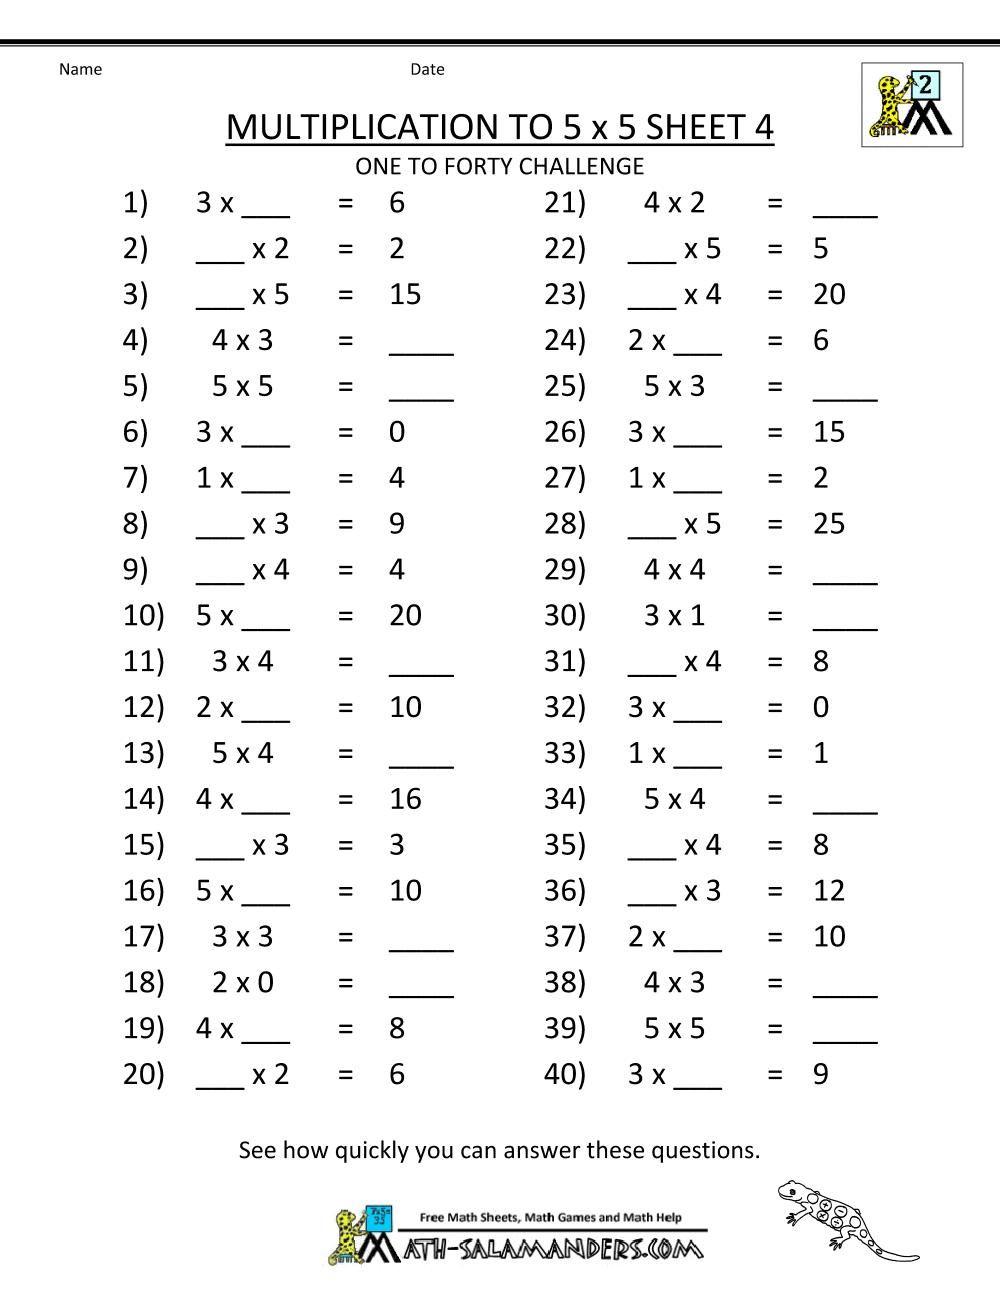 Multiplication Worksheets Grade 3 Coloring | 3Rd Grade Math within 3 Multiplication Worksheets